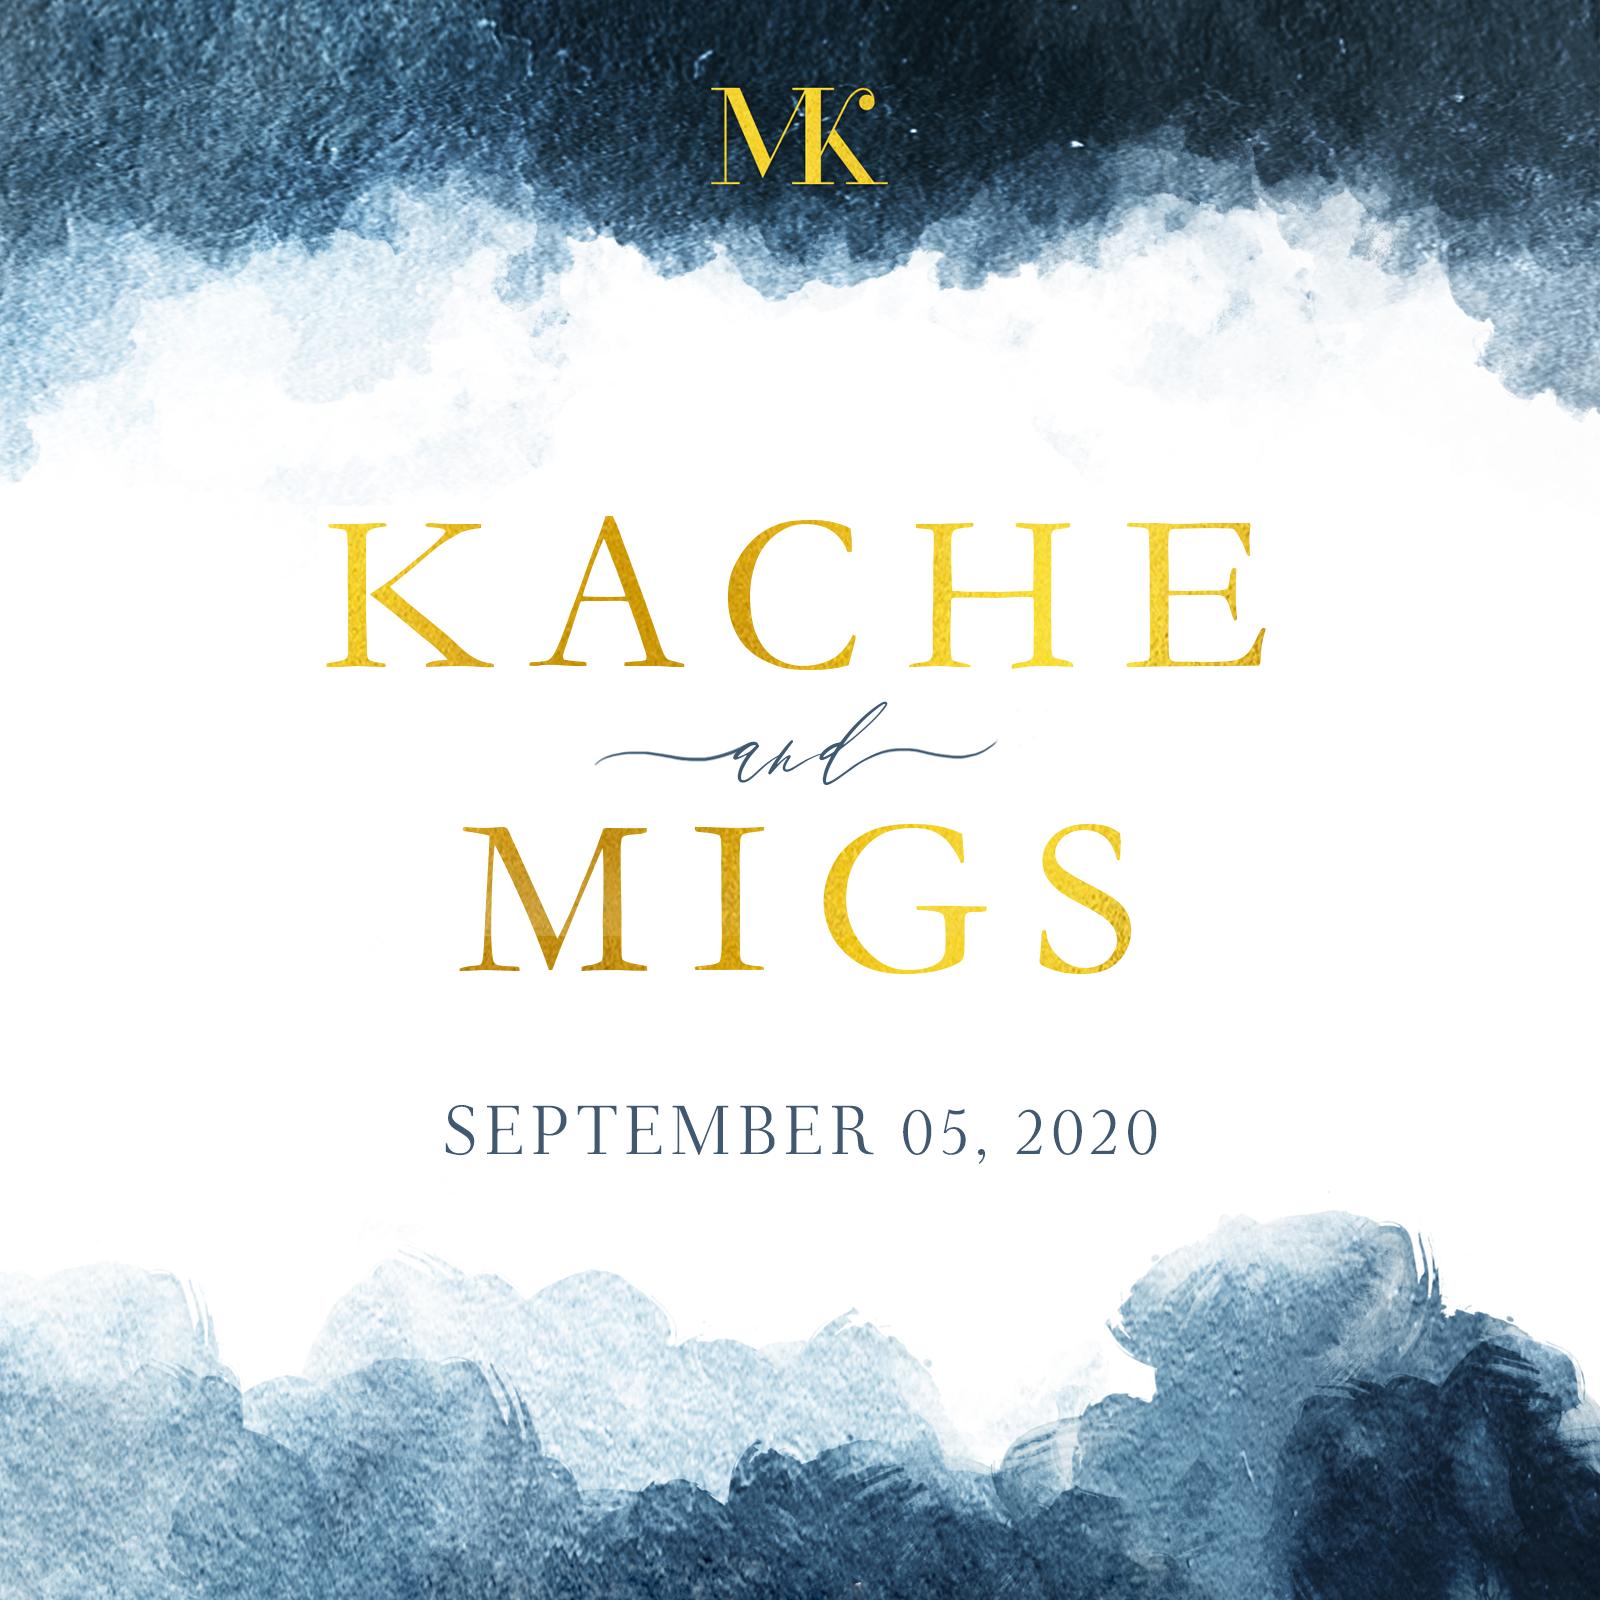 kache-migs01_splash